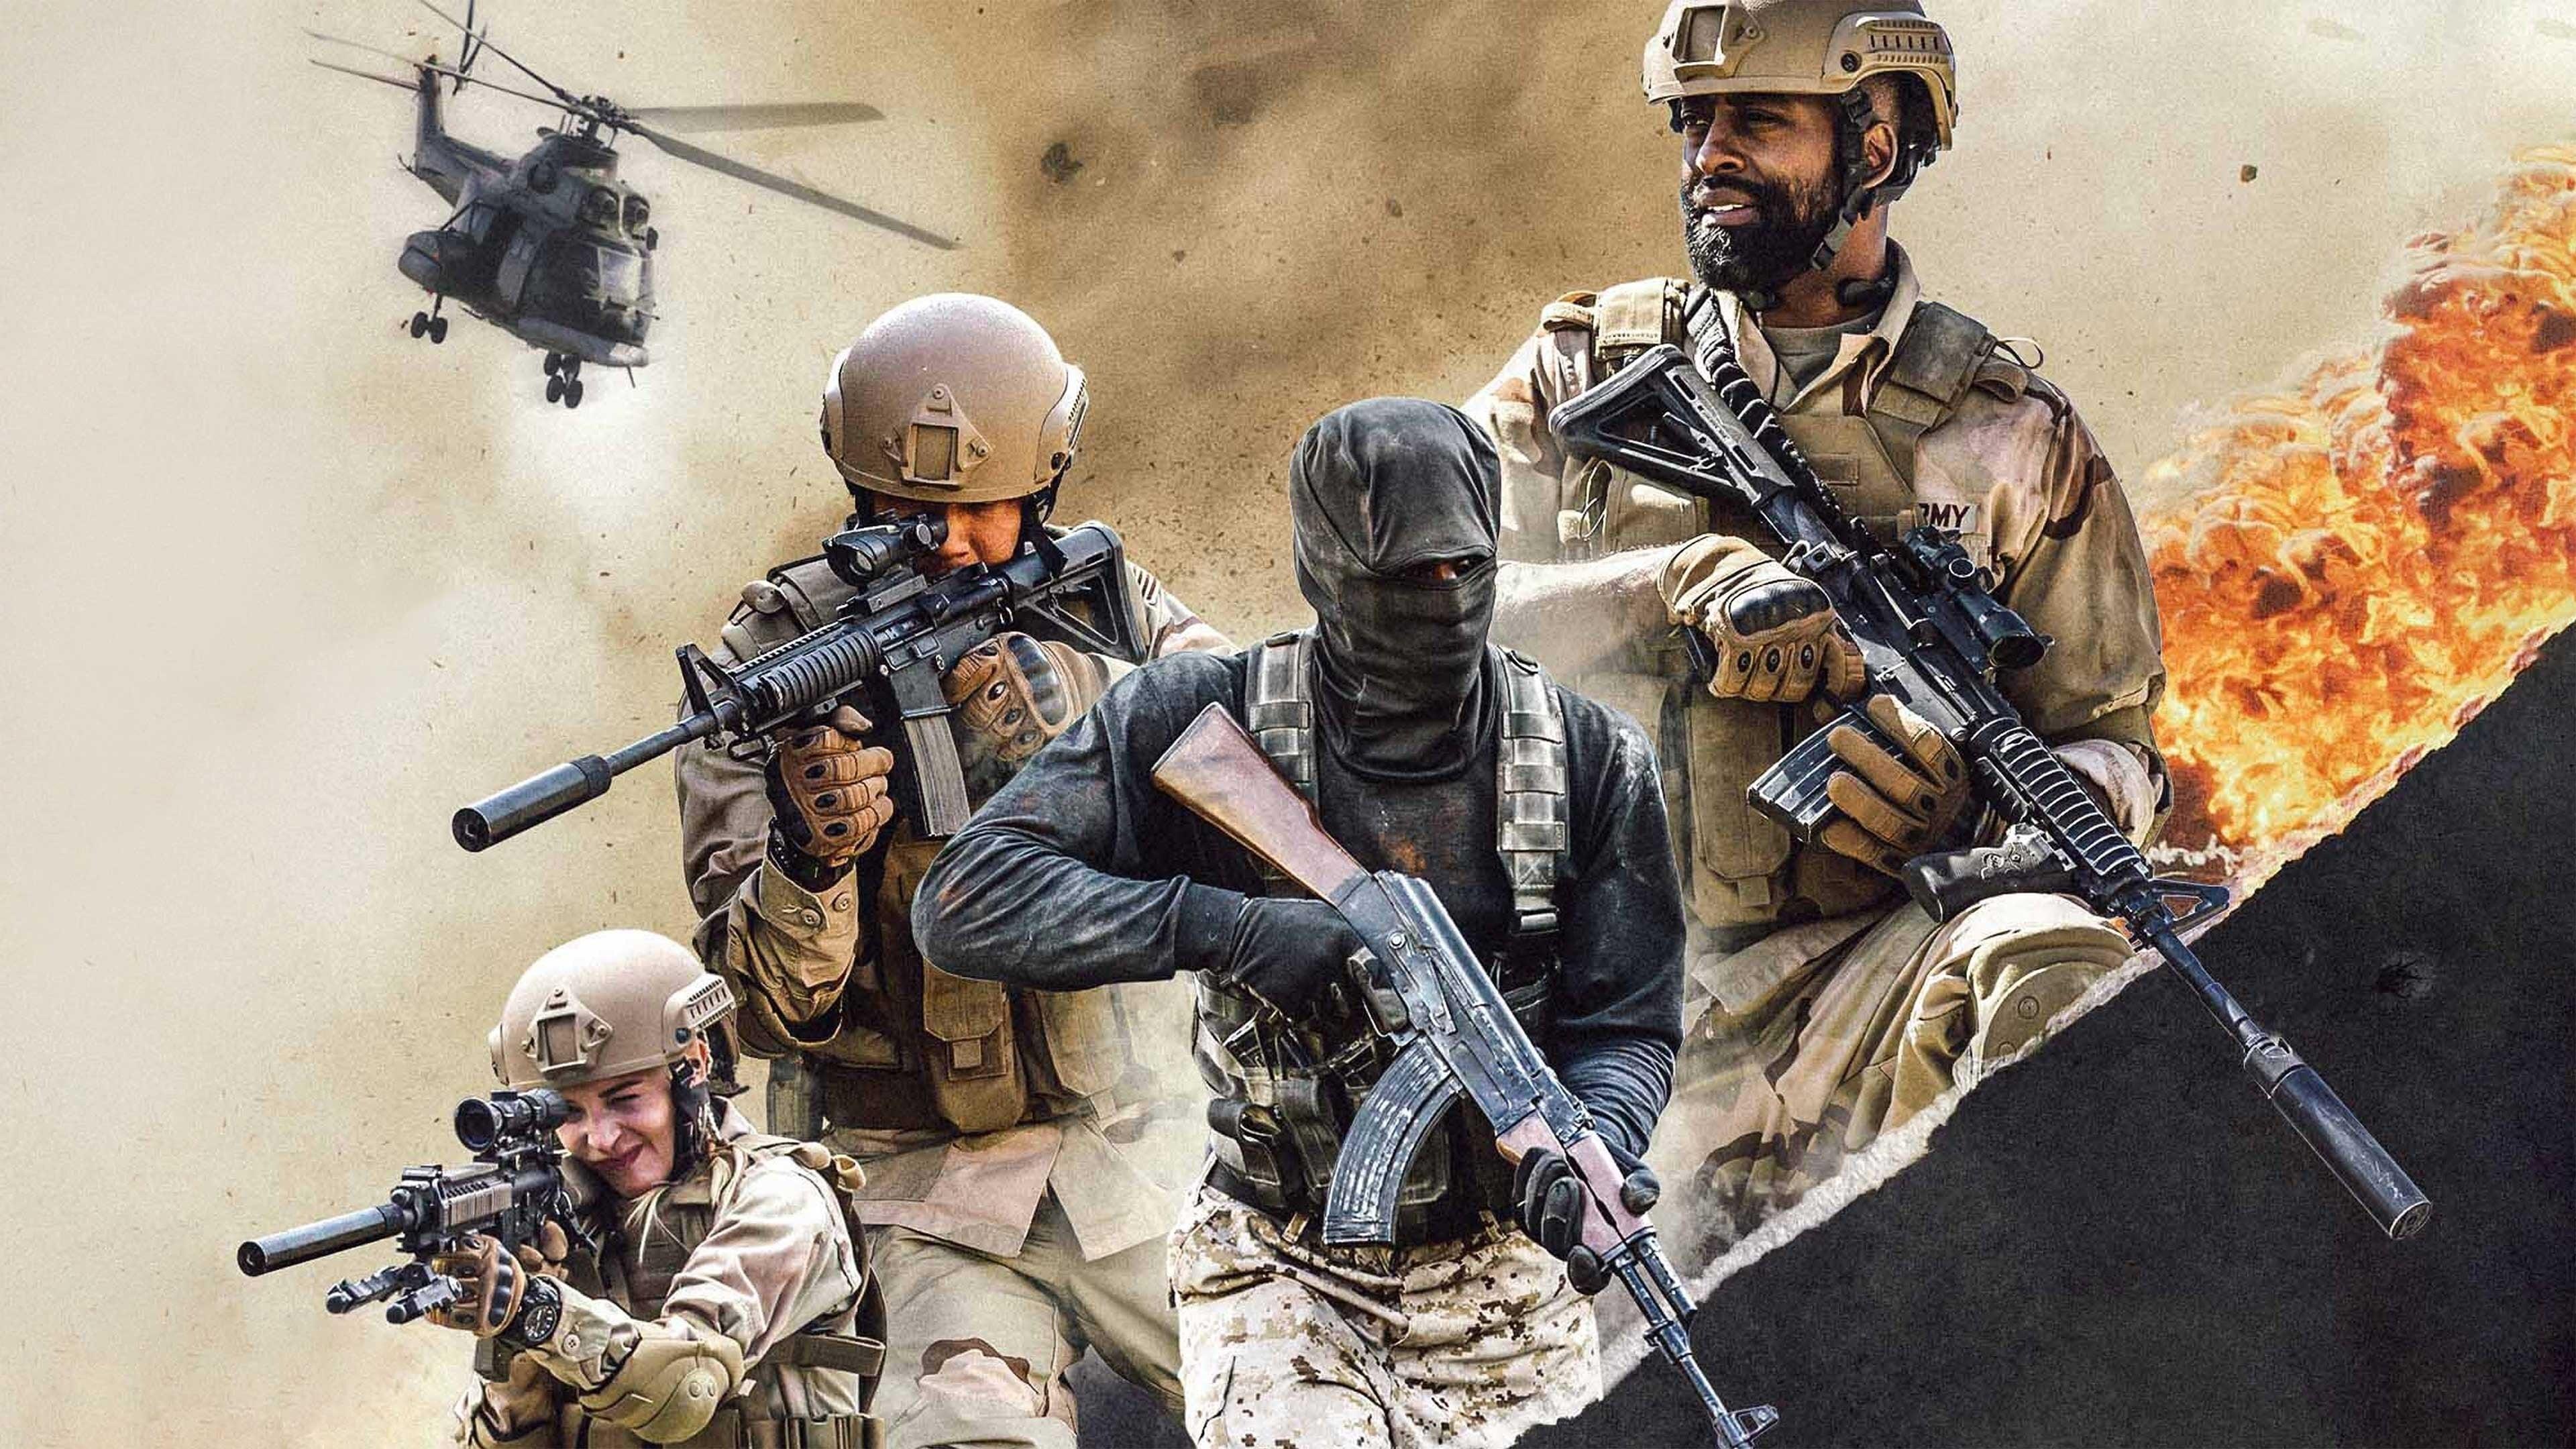 Rogue Warfare: Death of a Nation